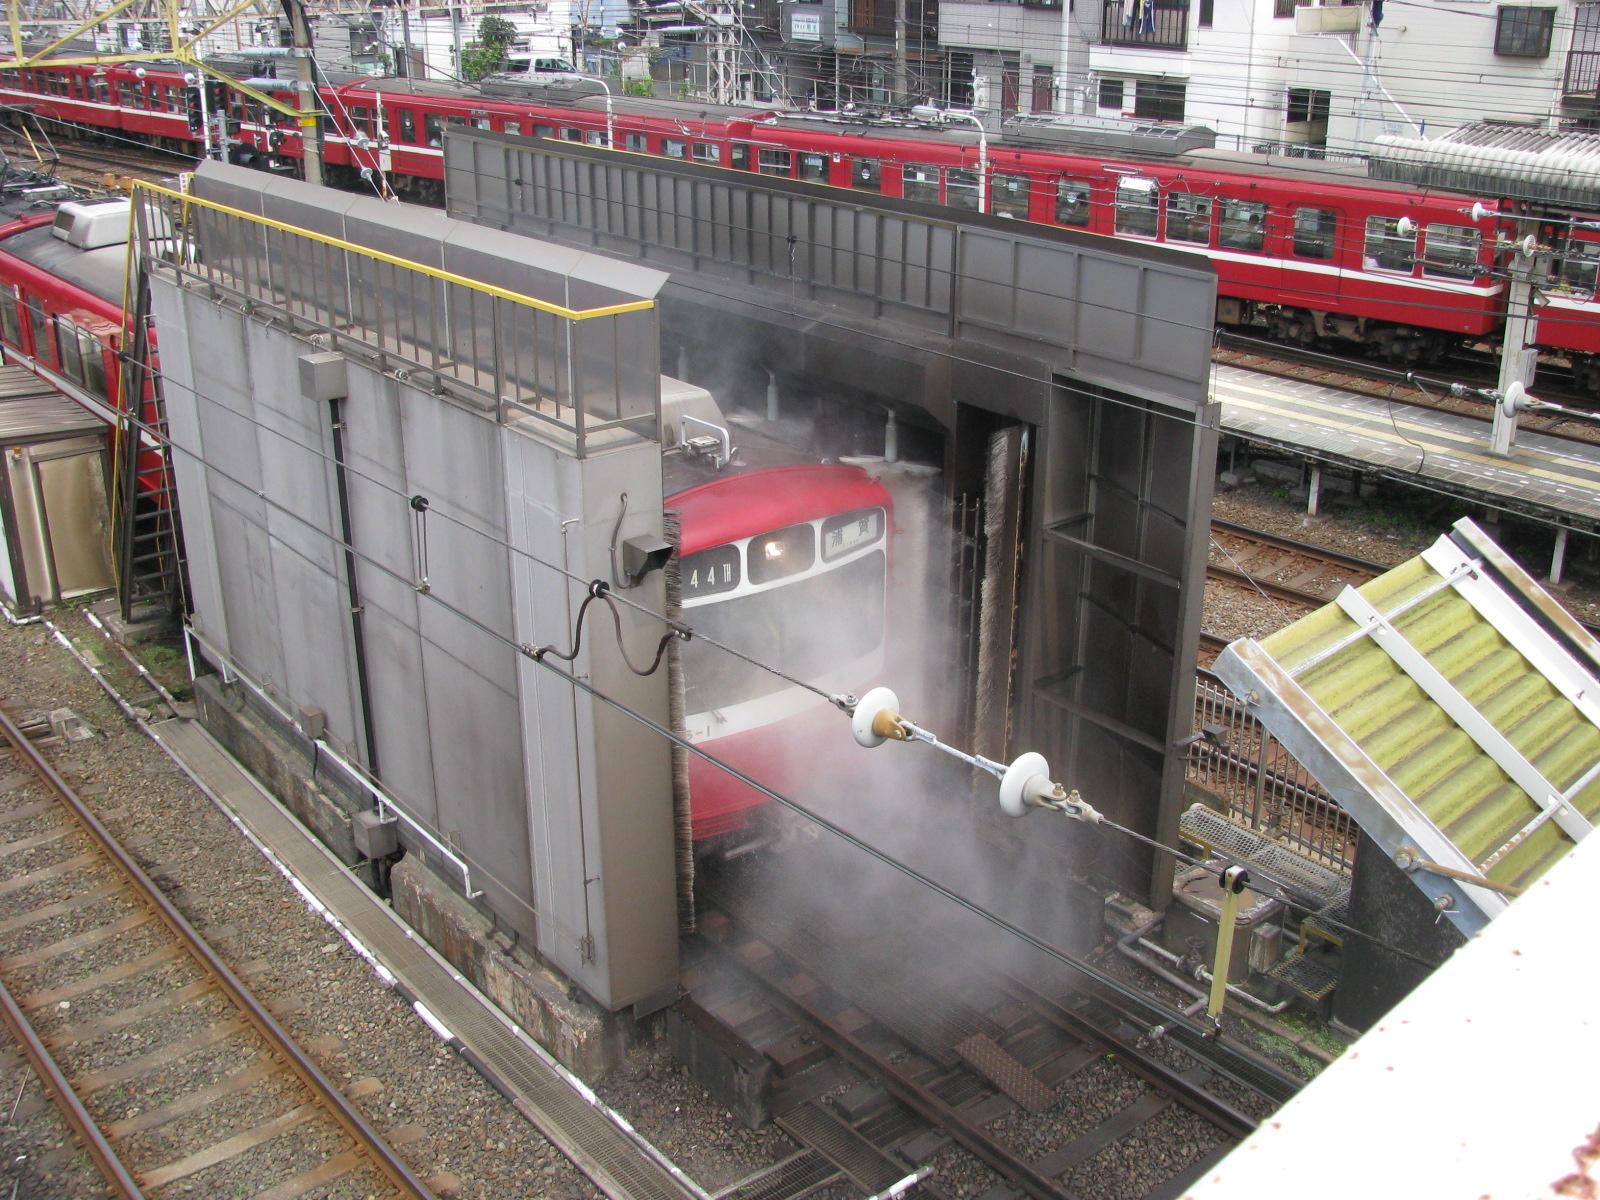 https://upload.wikimedia.org/wikipedia/commons/4/47/Train_washing_machine_01.jpg